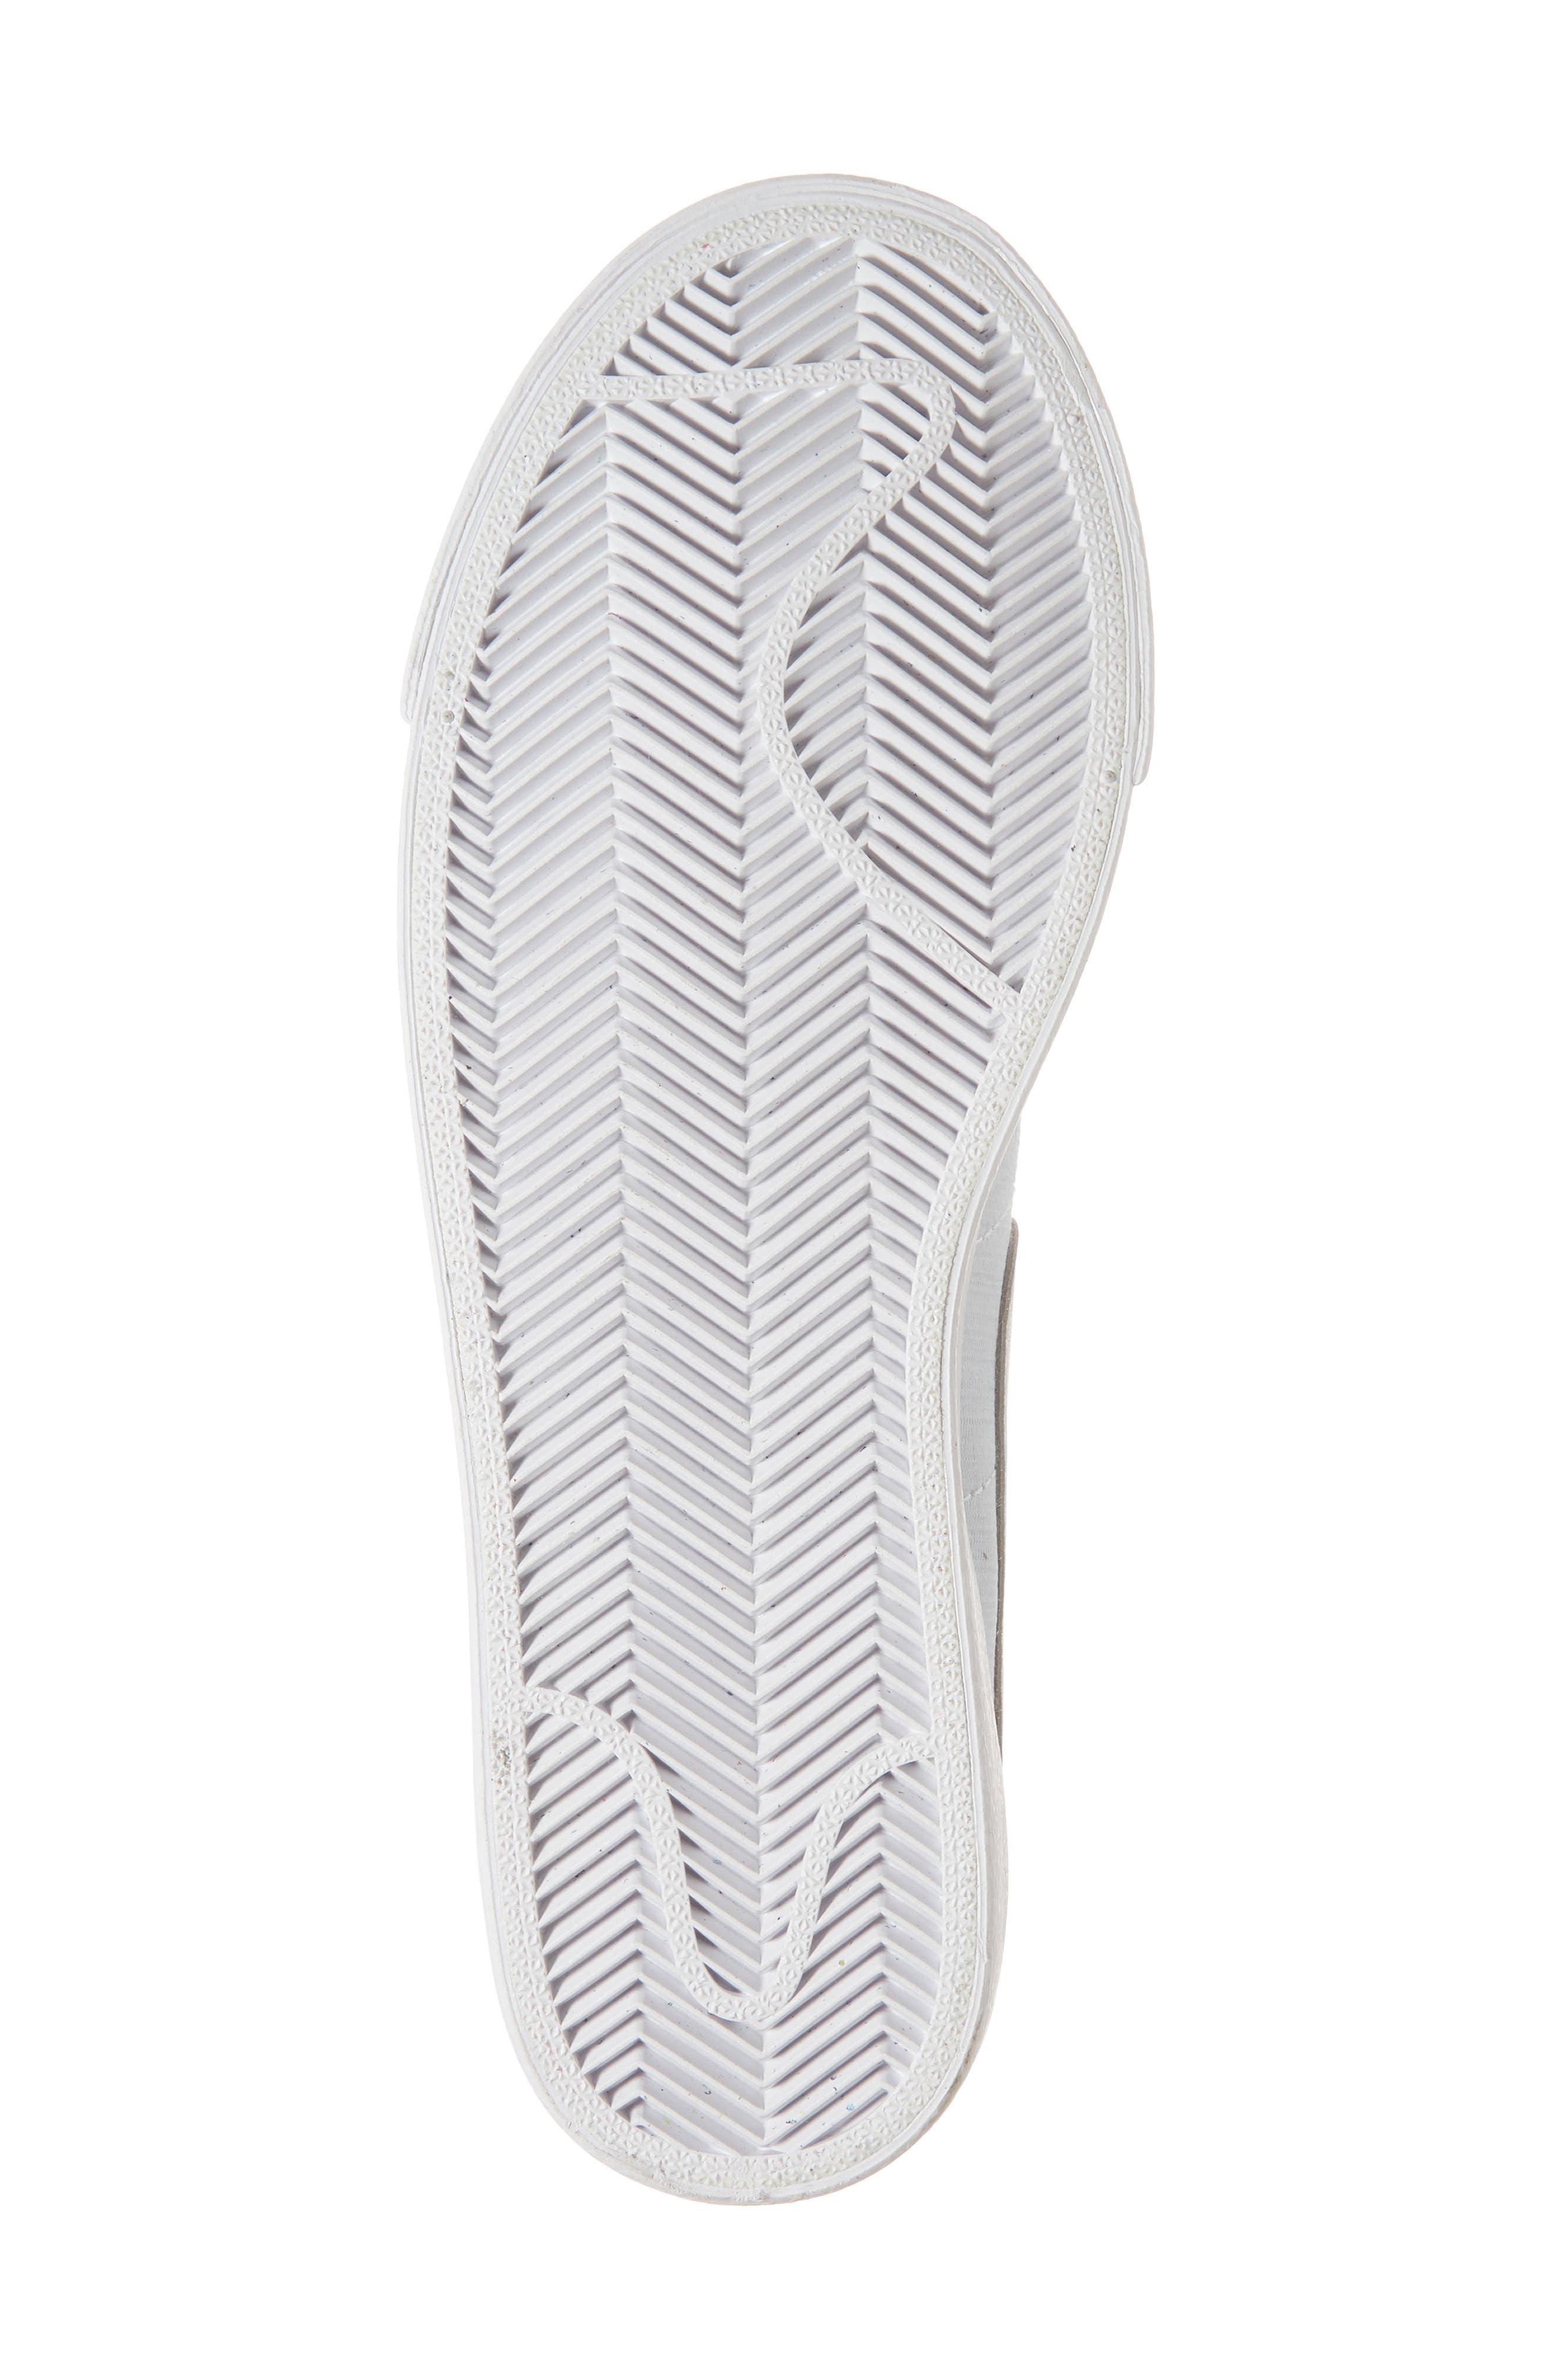 Blazer Low Top Sneaker SE,                             Alternate thumbnail 6, color,                             040